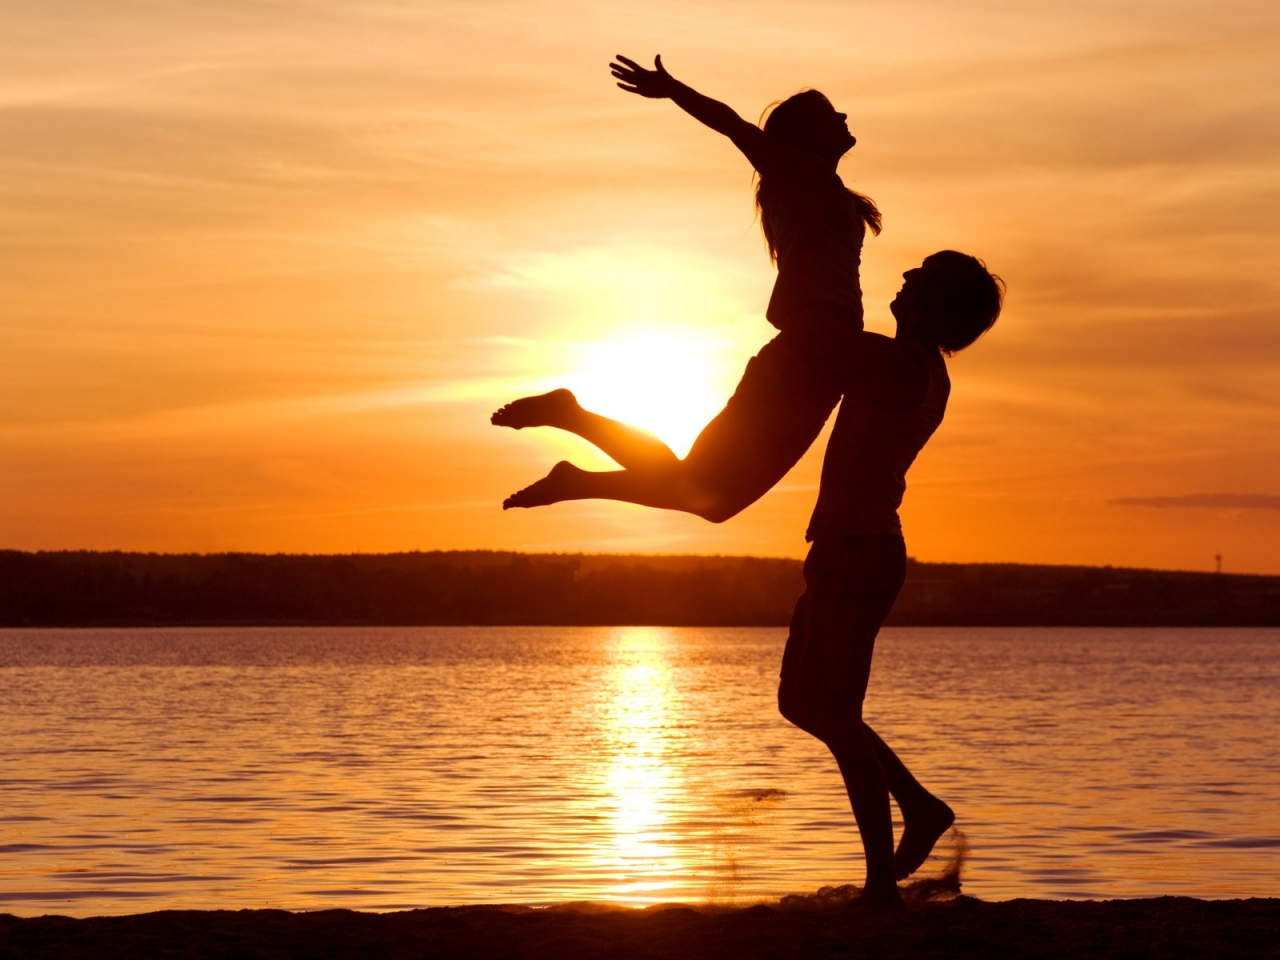 Pareja de enamorados - 1280x960